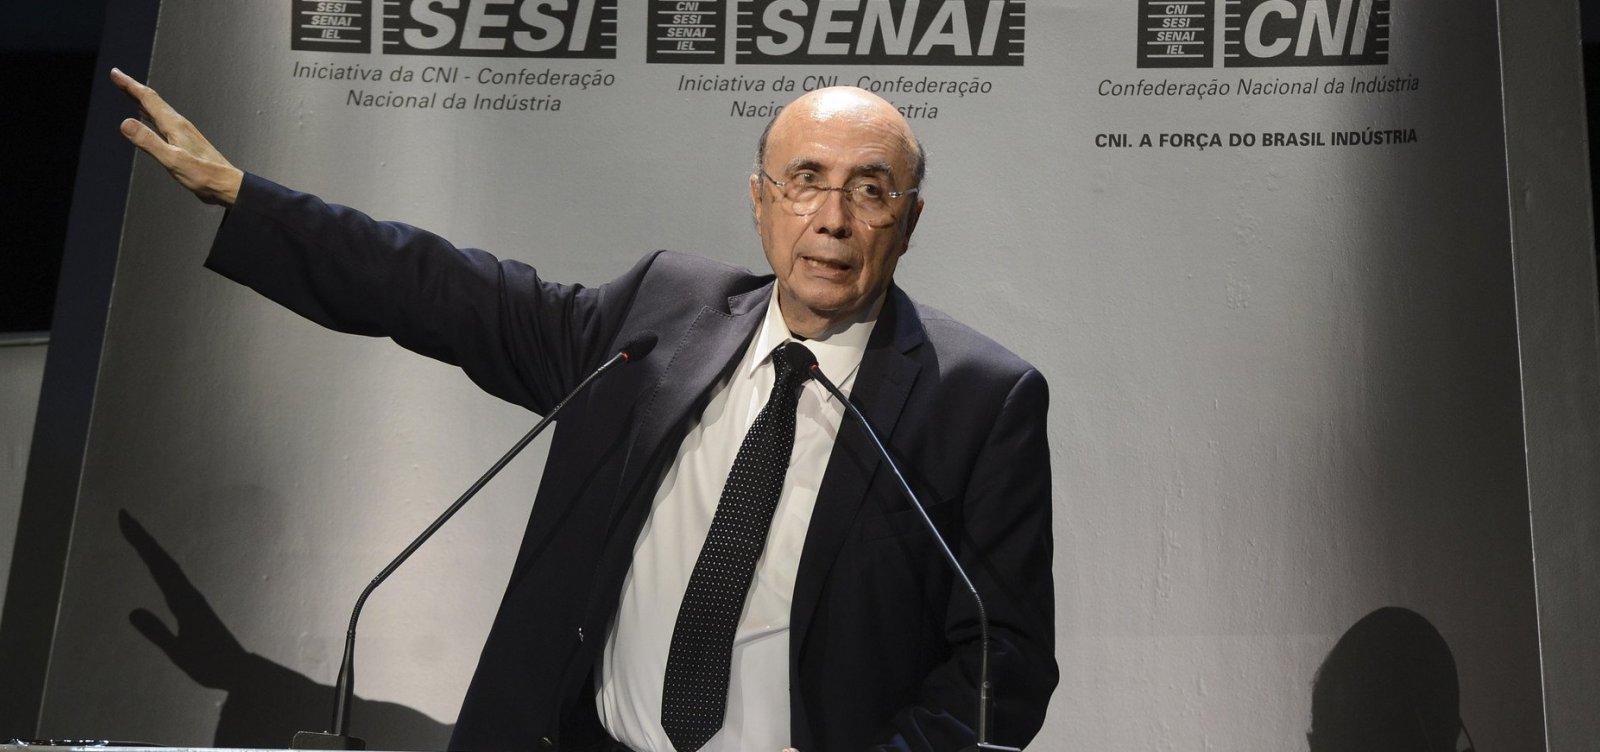 [Meirelles quer ultrapassar Alckmin em intenções de votos]